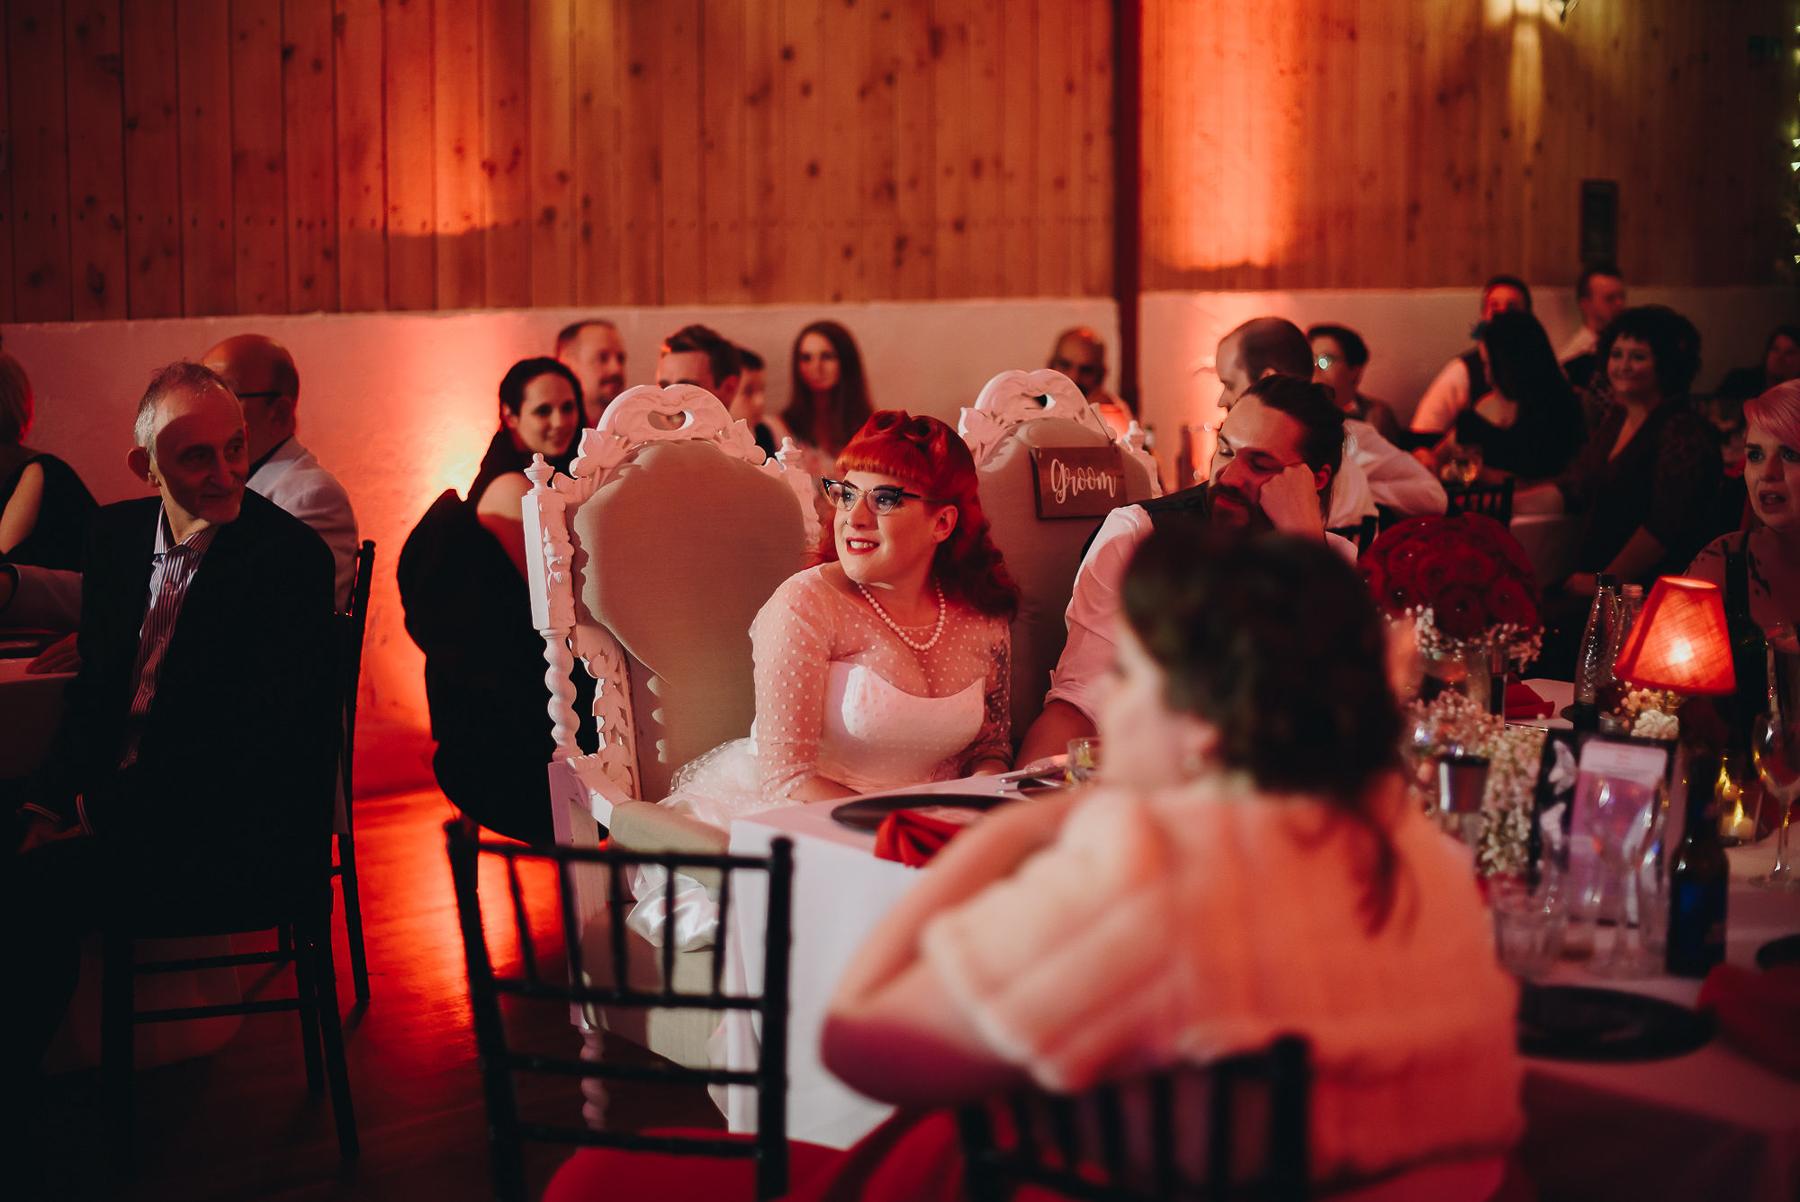 Wellbeing_Farm_Wedding_Photography_The_Pin-Up_Bride_Lara_Shaun-126.jpg